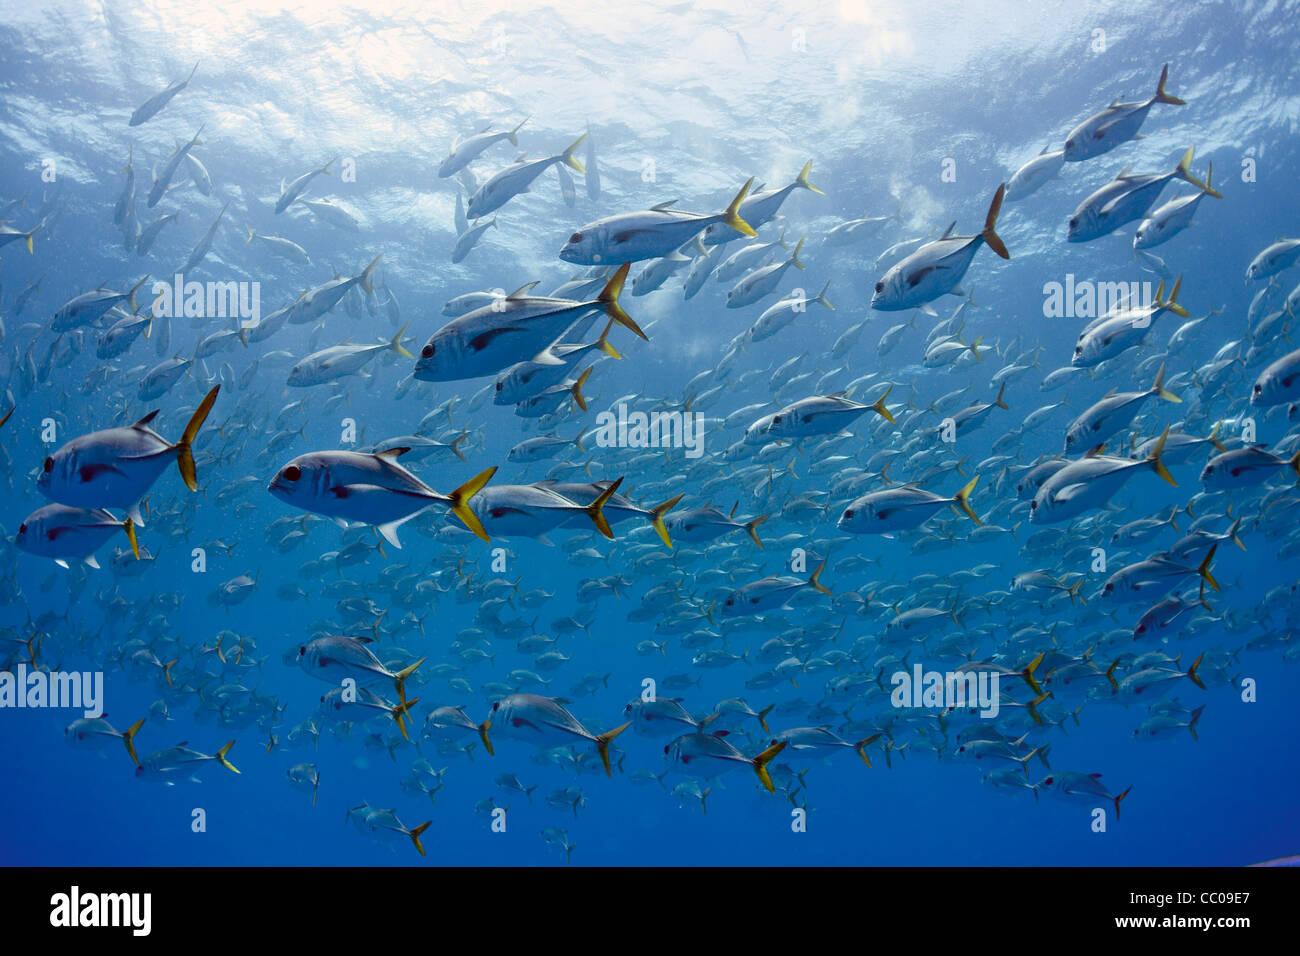 A large school of horse-eye jacks (Caranx latus) off the coast of Cuba. - Stock Image